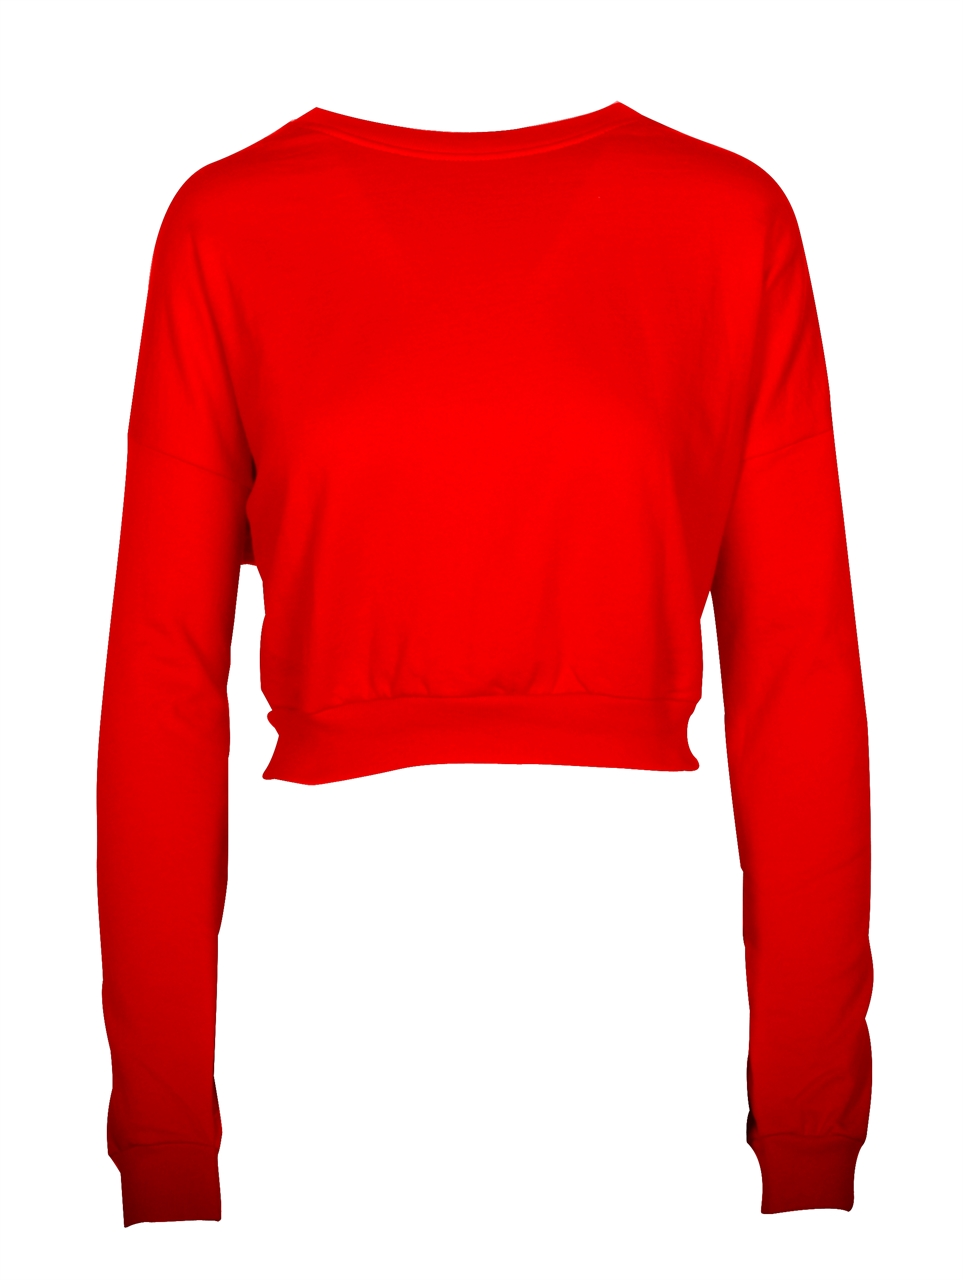 Picture of American Apparel California Fleece Cropped Sweatshirt